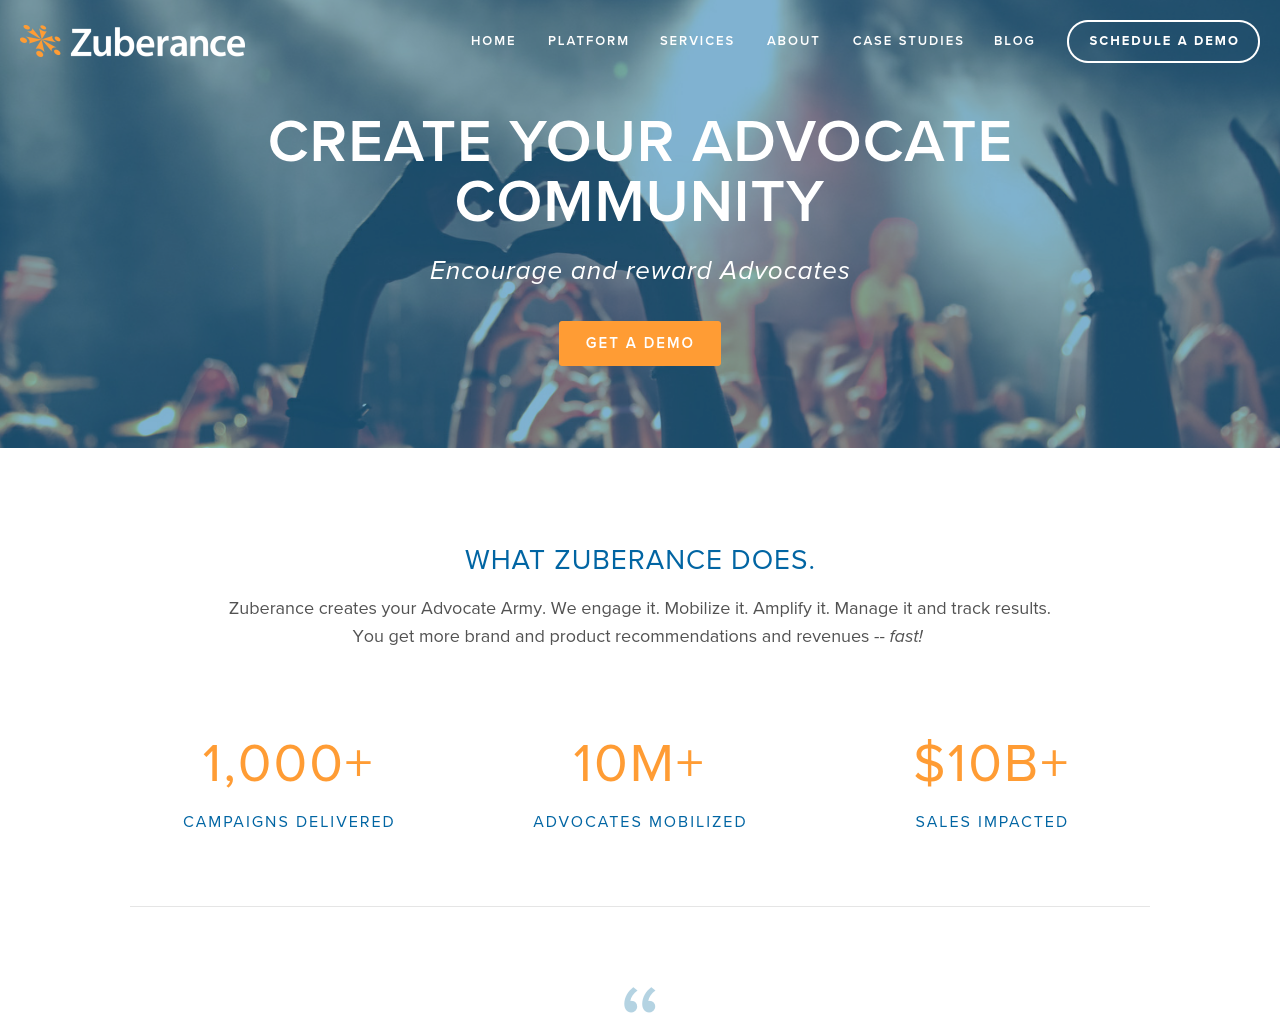 Zuberance-Advertising-Reviews-Pricing